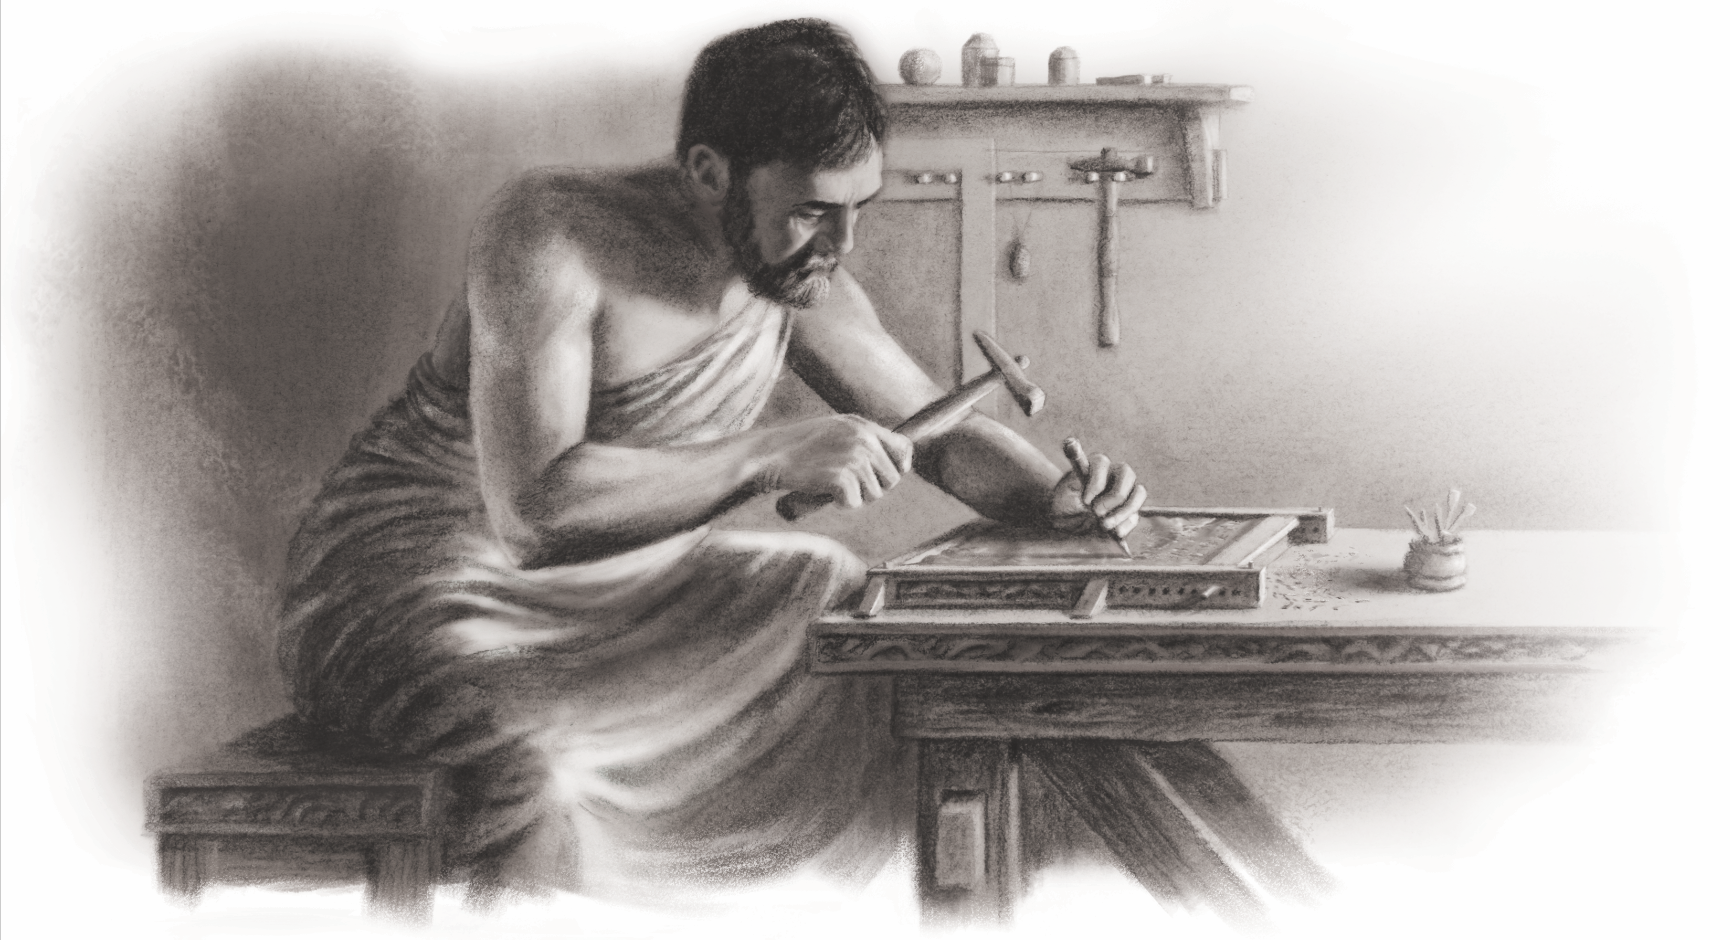 Biblical View of Man